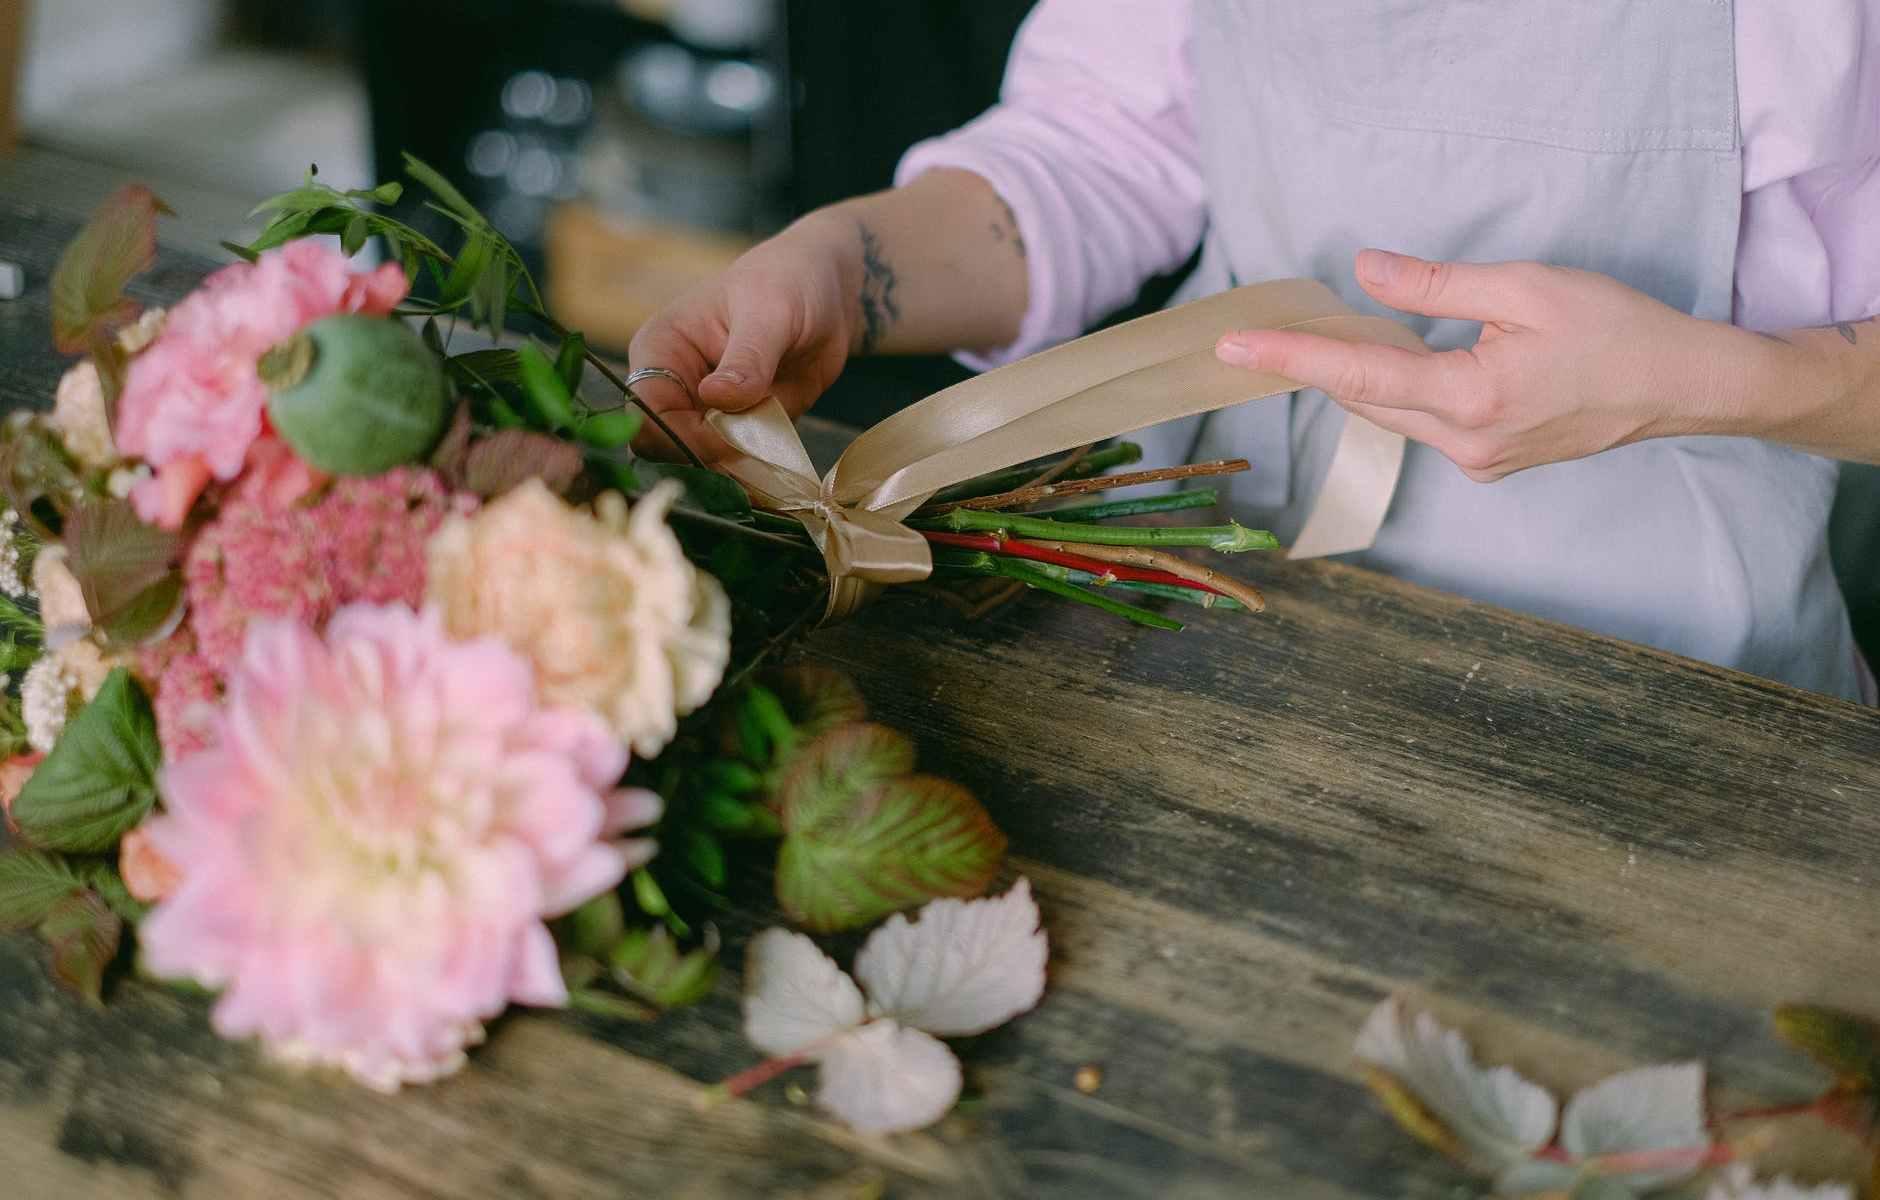 person arranging bouquet of flowers